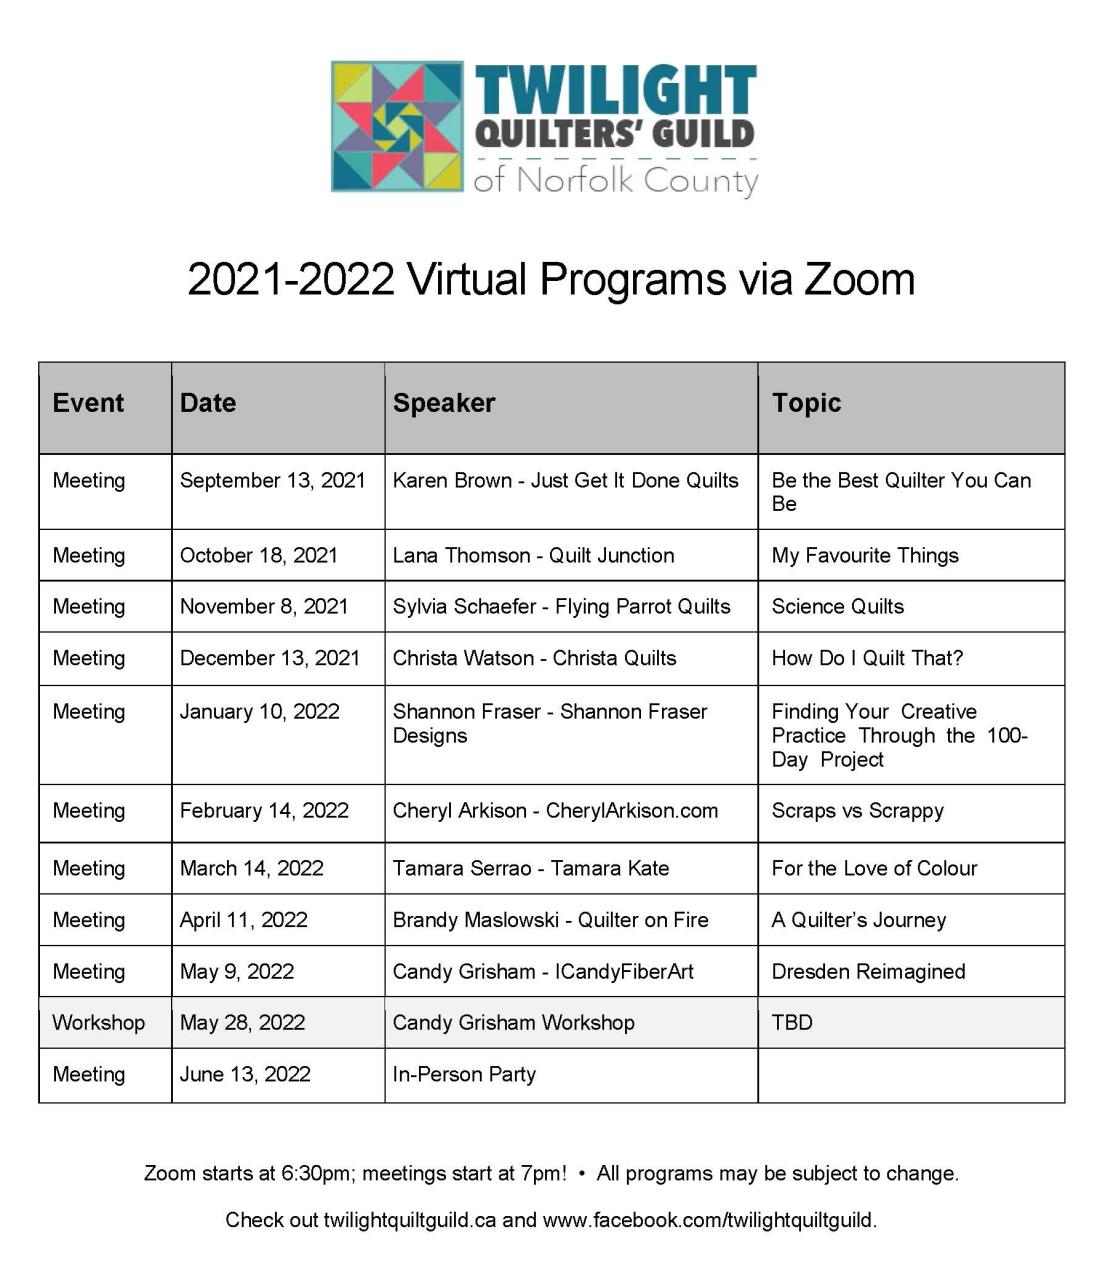 TQG 2021-22 Program